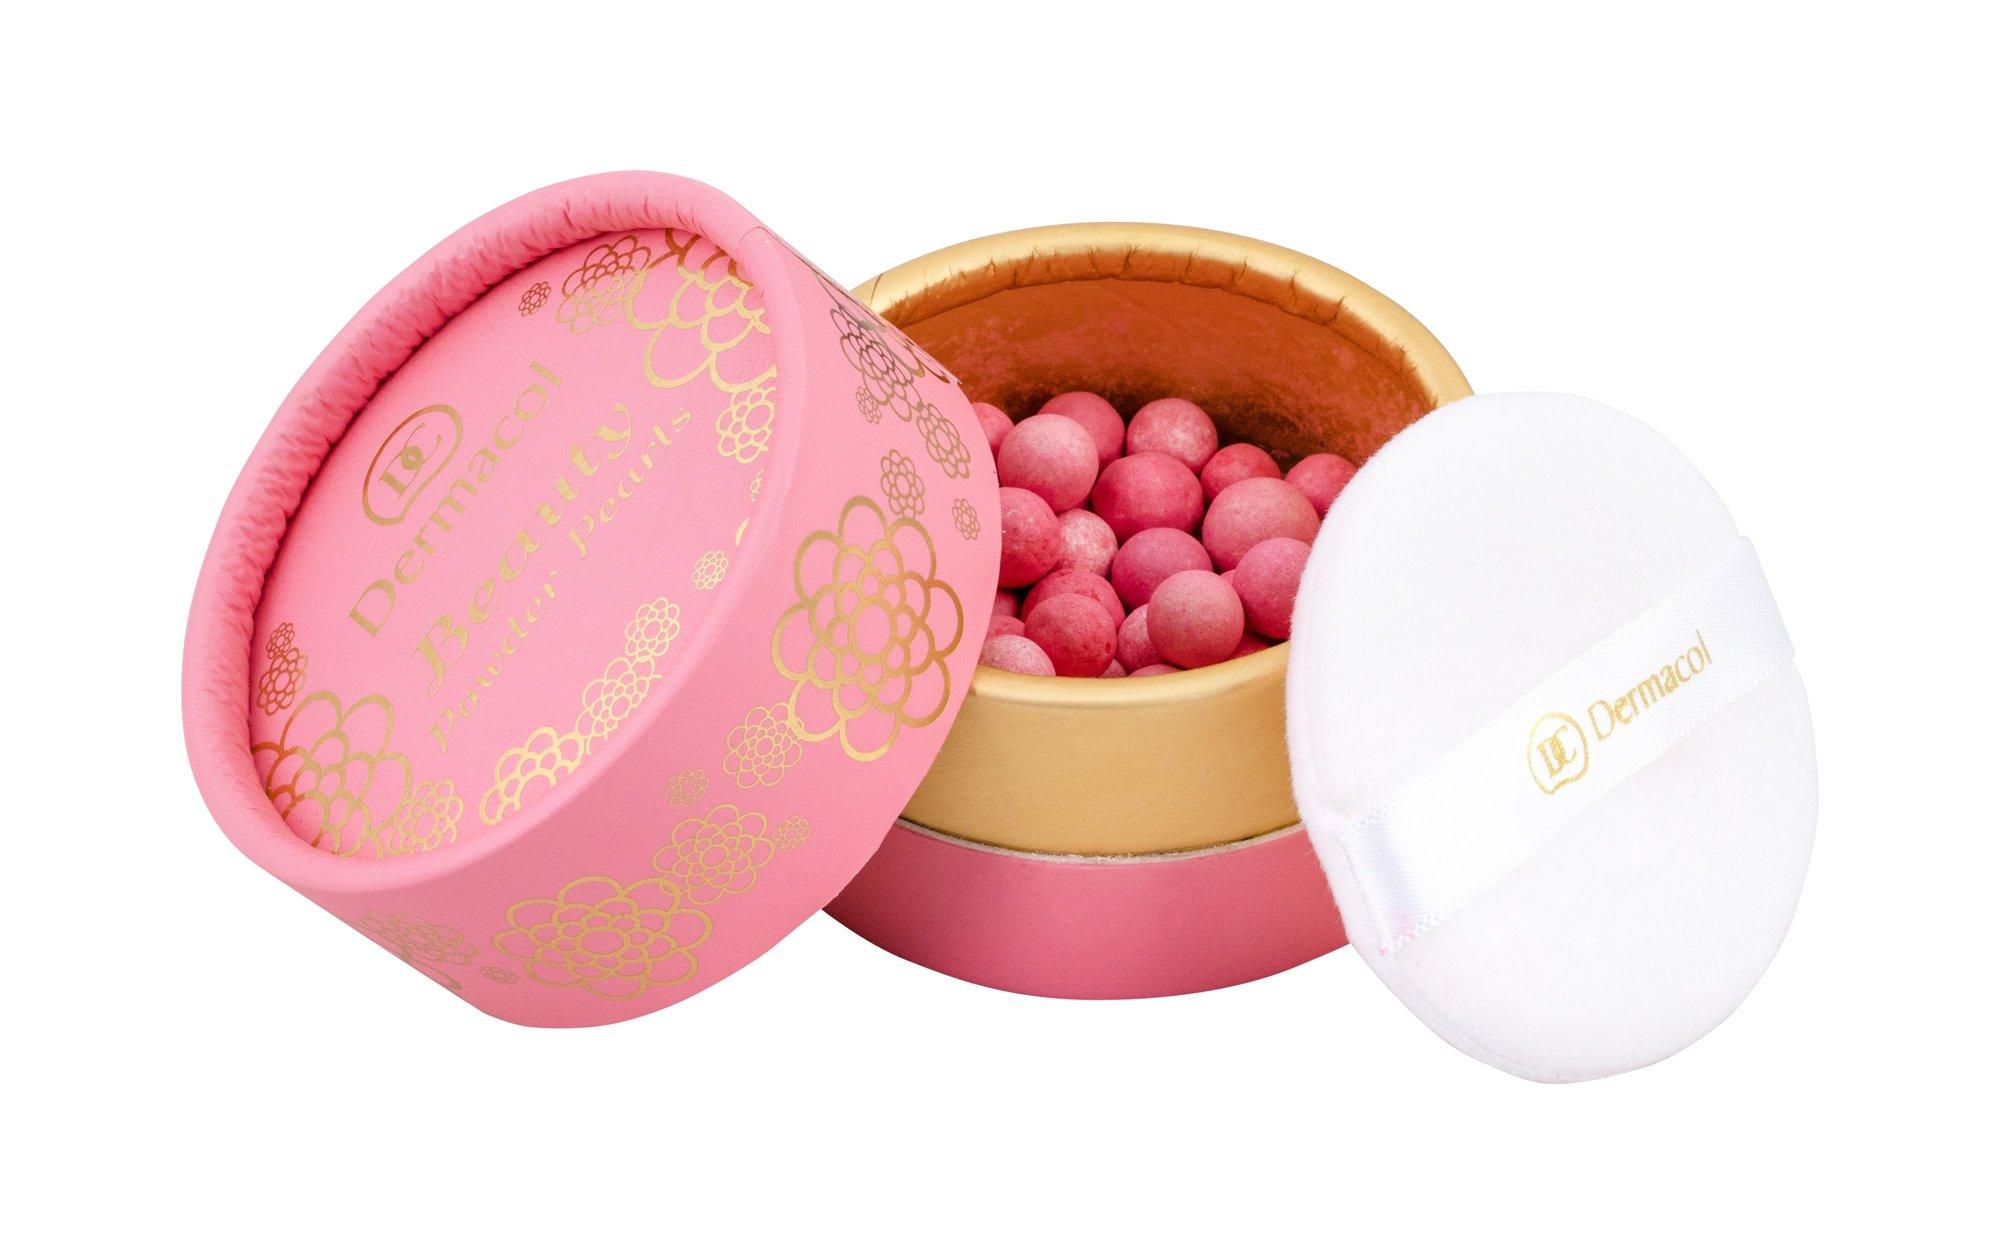 Dermacol Beauty Powder Pearls Brightener 25ml Illuminating